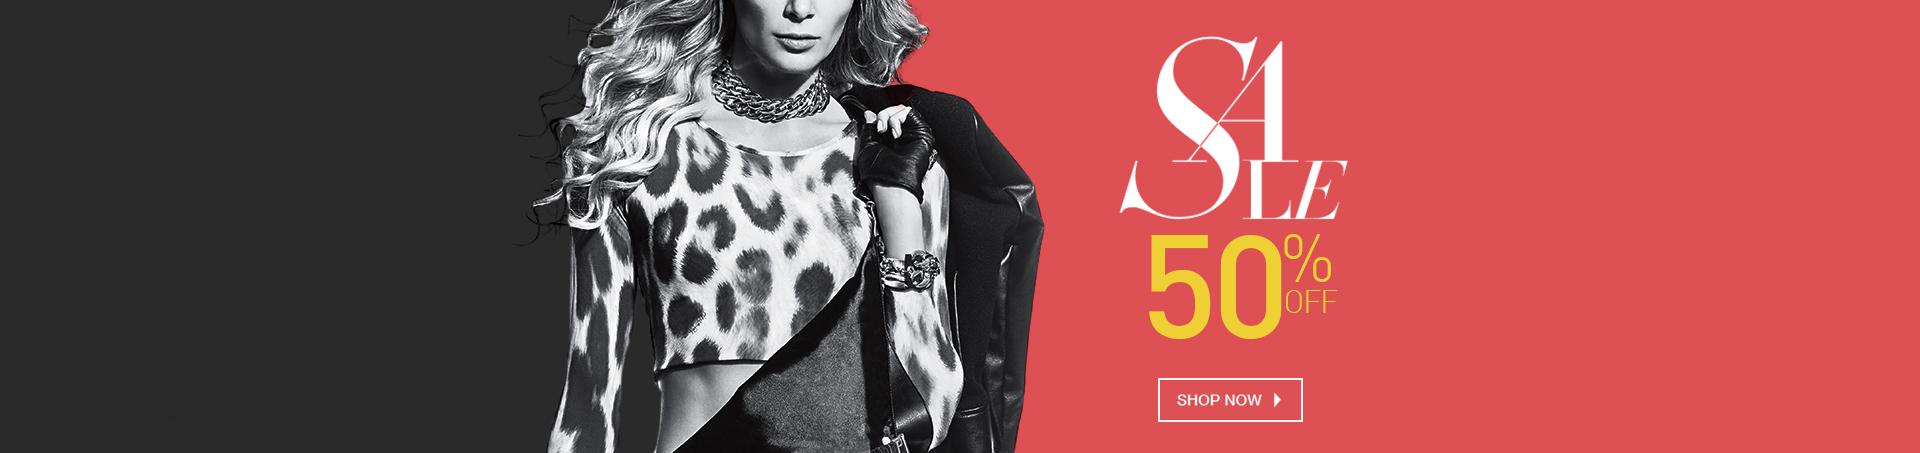 Loja Oficial Lança Perfume e-Shop | Moda Fashion e Exclusiva | Lança Perfume e-Shop